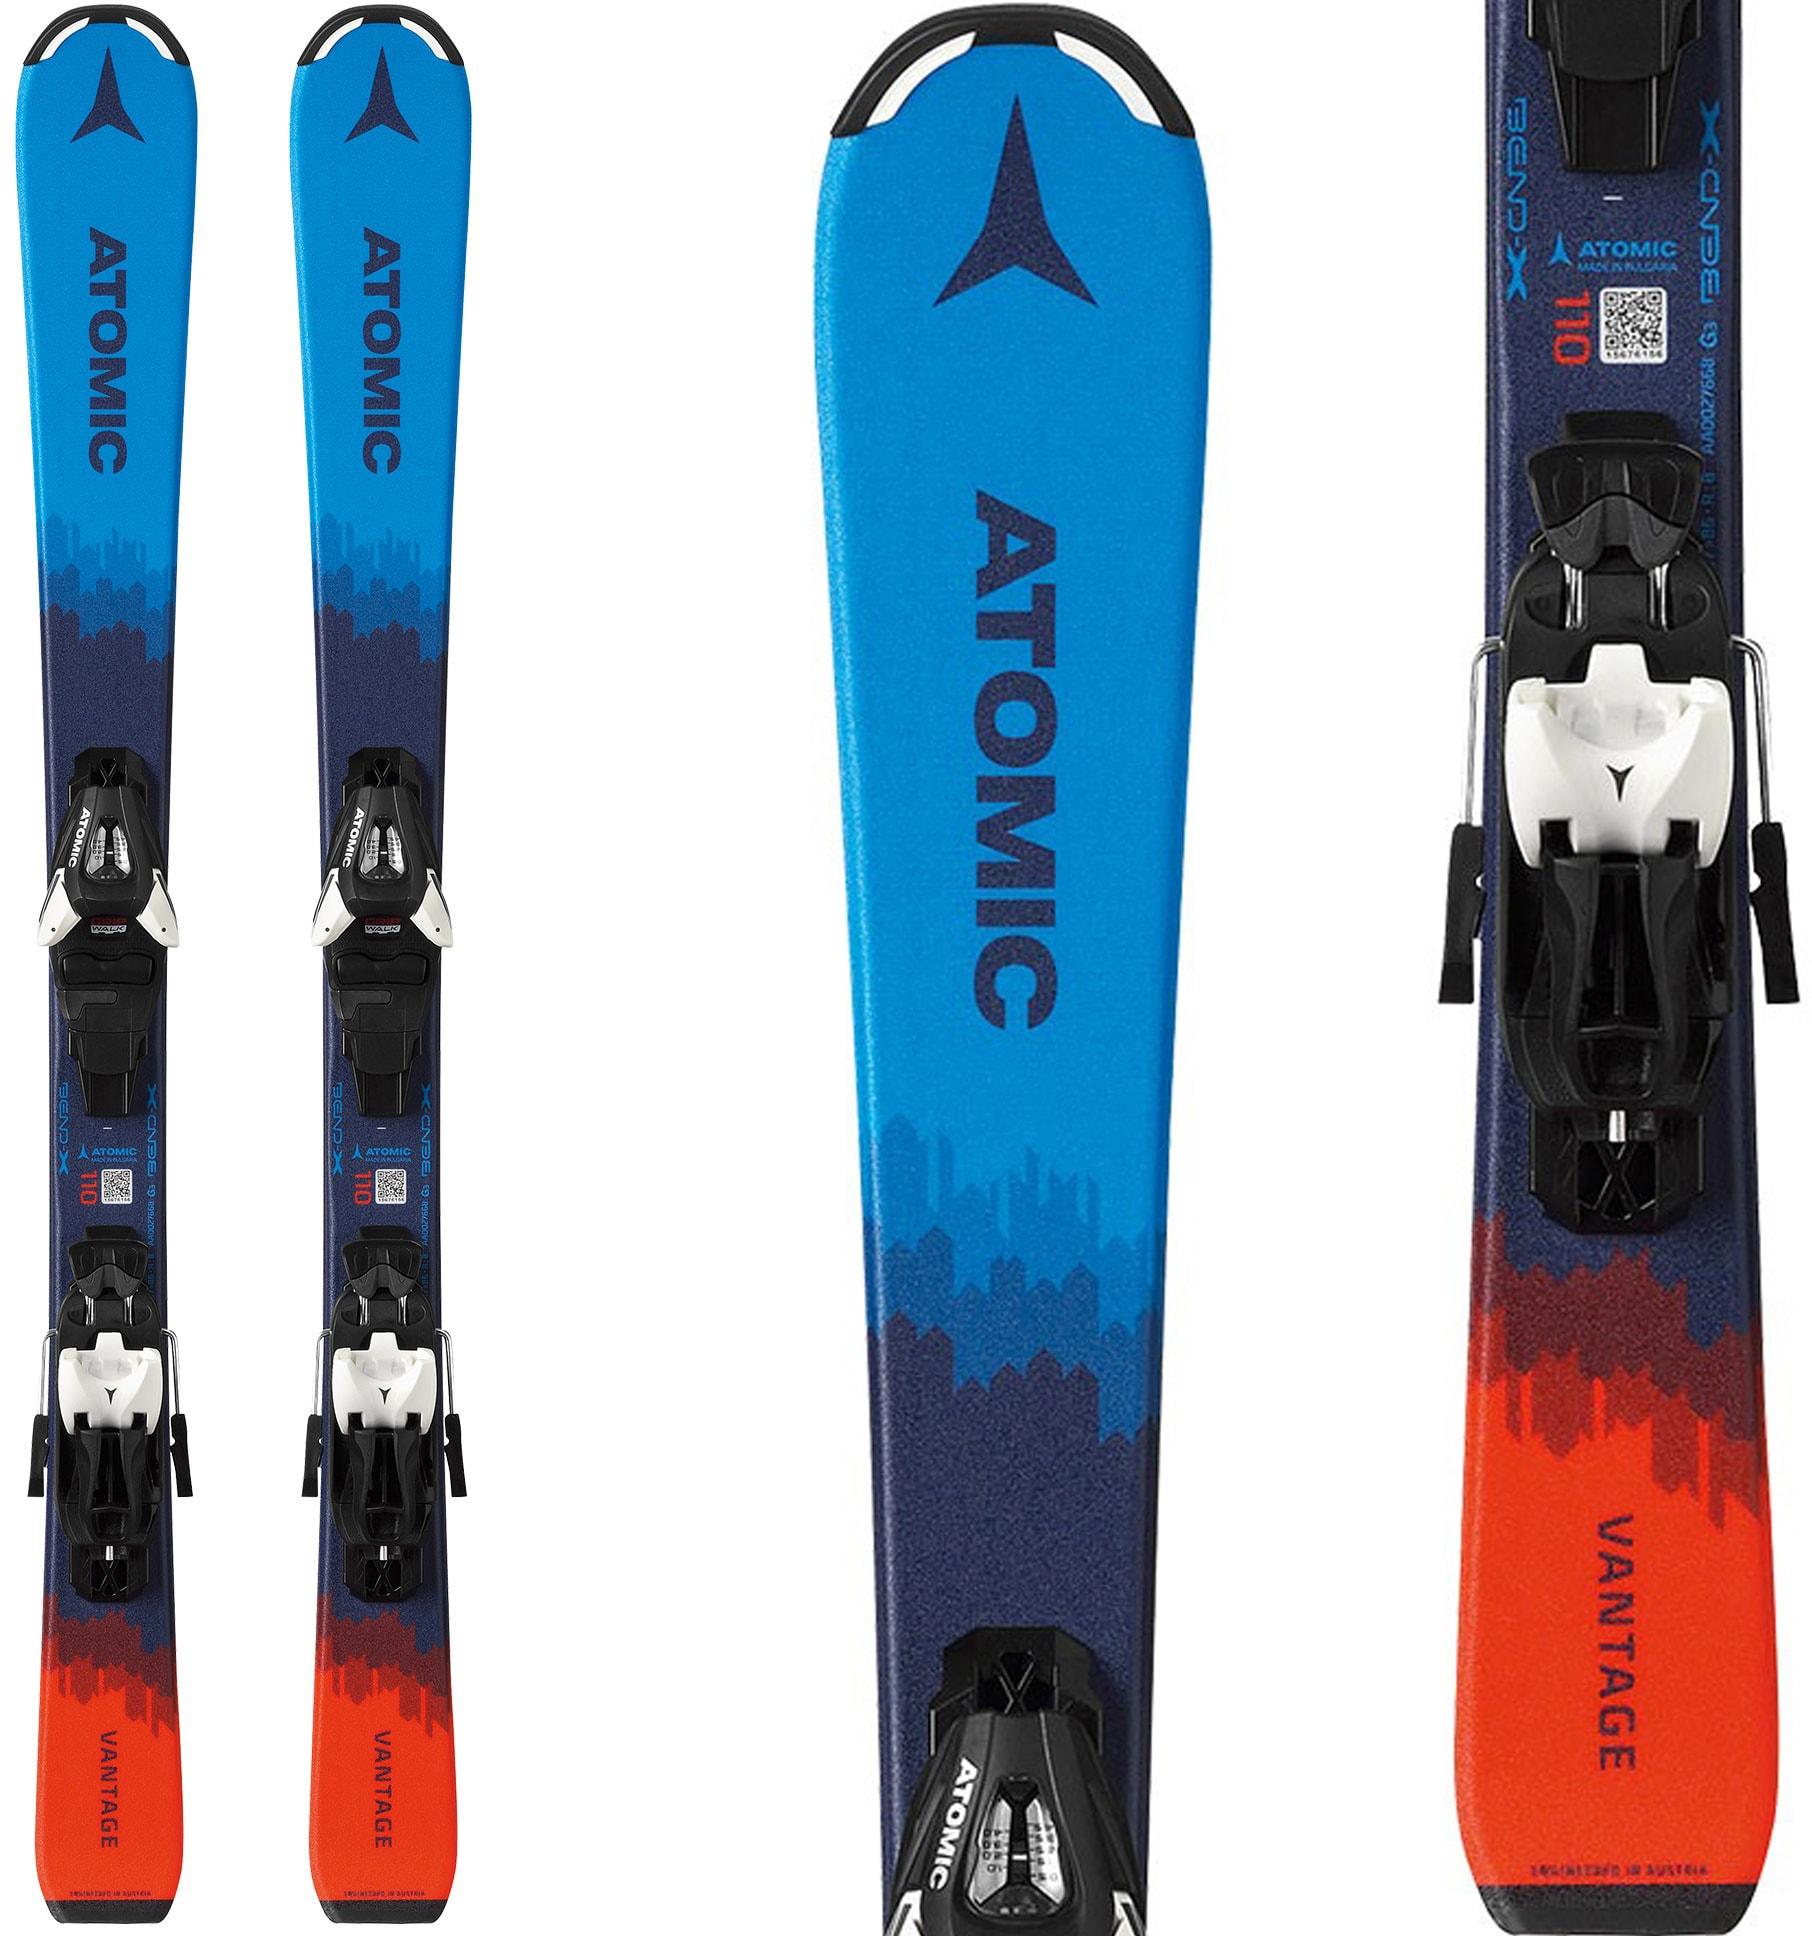 Atomic Vantage Jr Skis W/ C5 GW Bindings